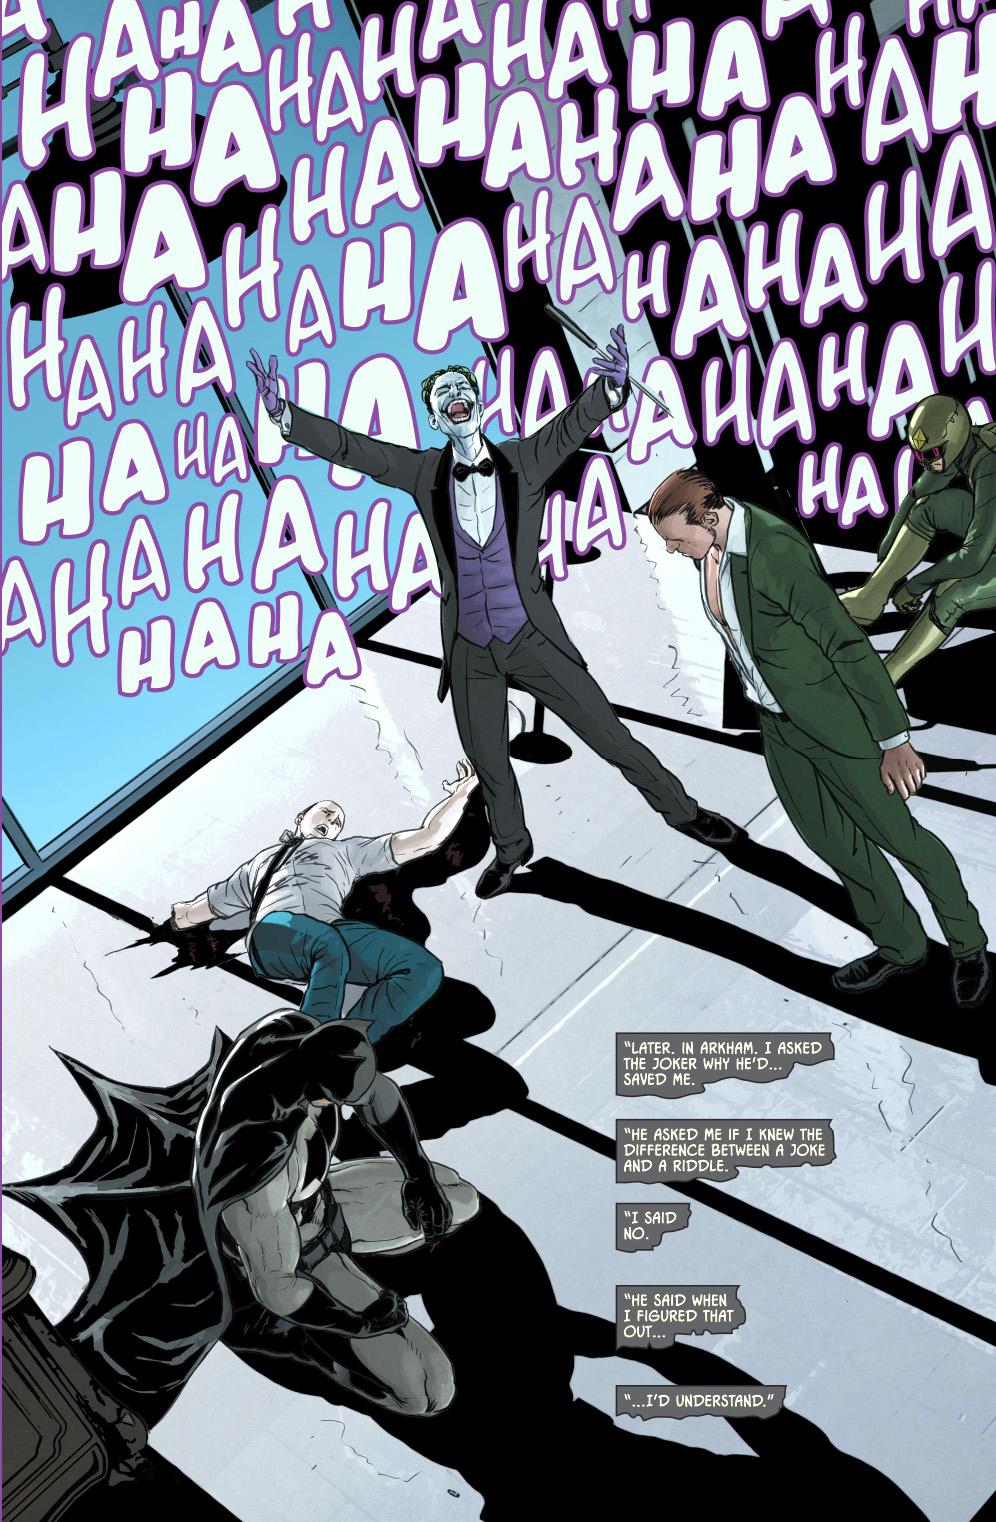 Batman Breaks His No Killing Rule Comicnewbies